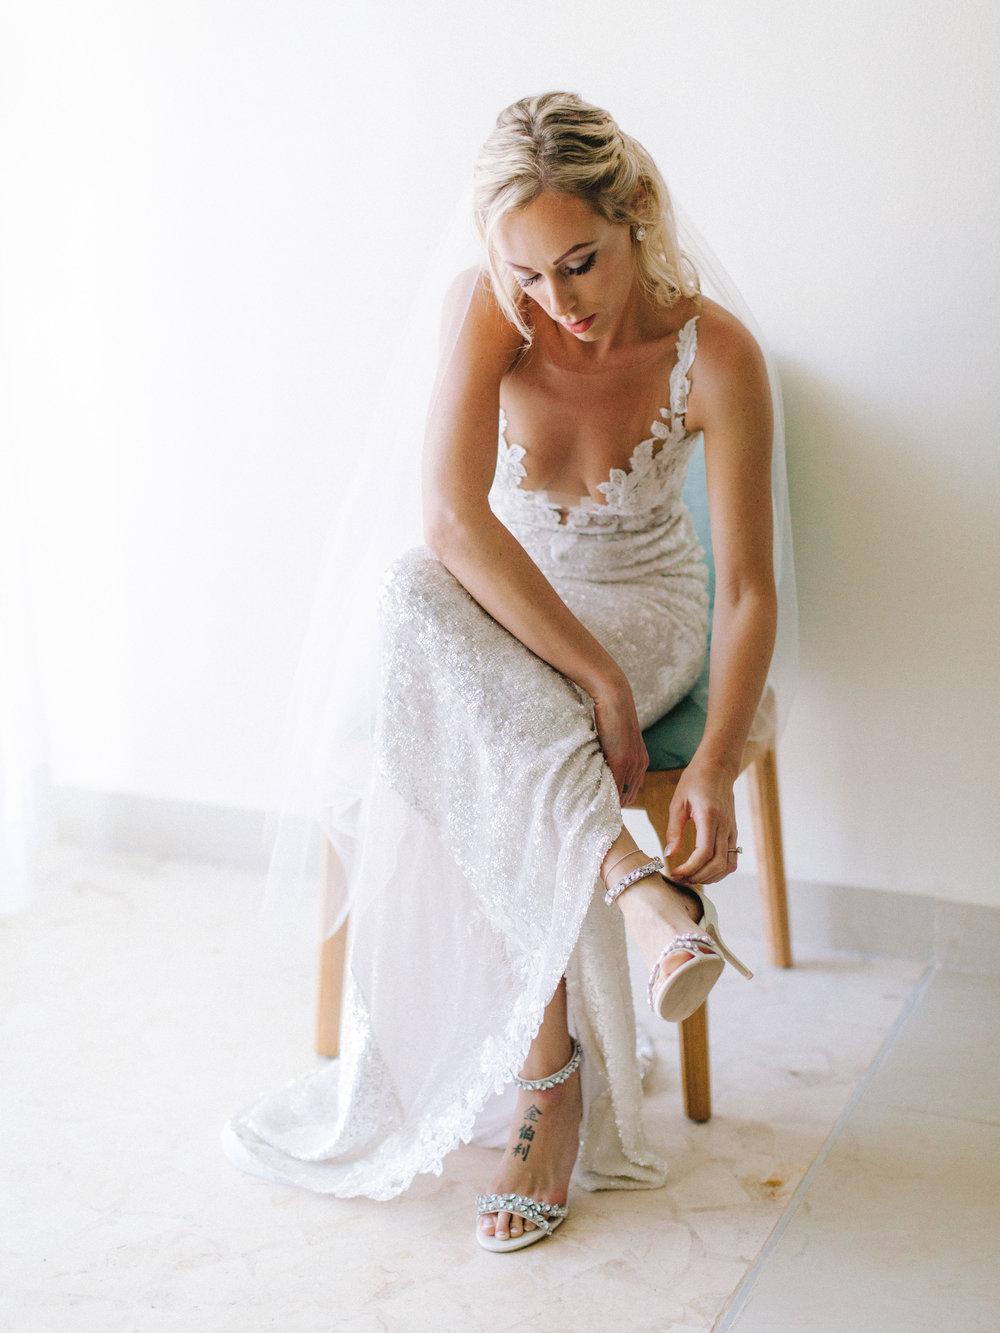 Kim_Jeff_Cancun Wedding_Getting_Ready_Kurtz_Orpia (77 of 105).jpg